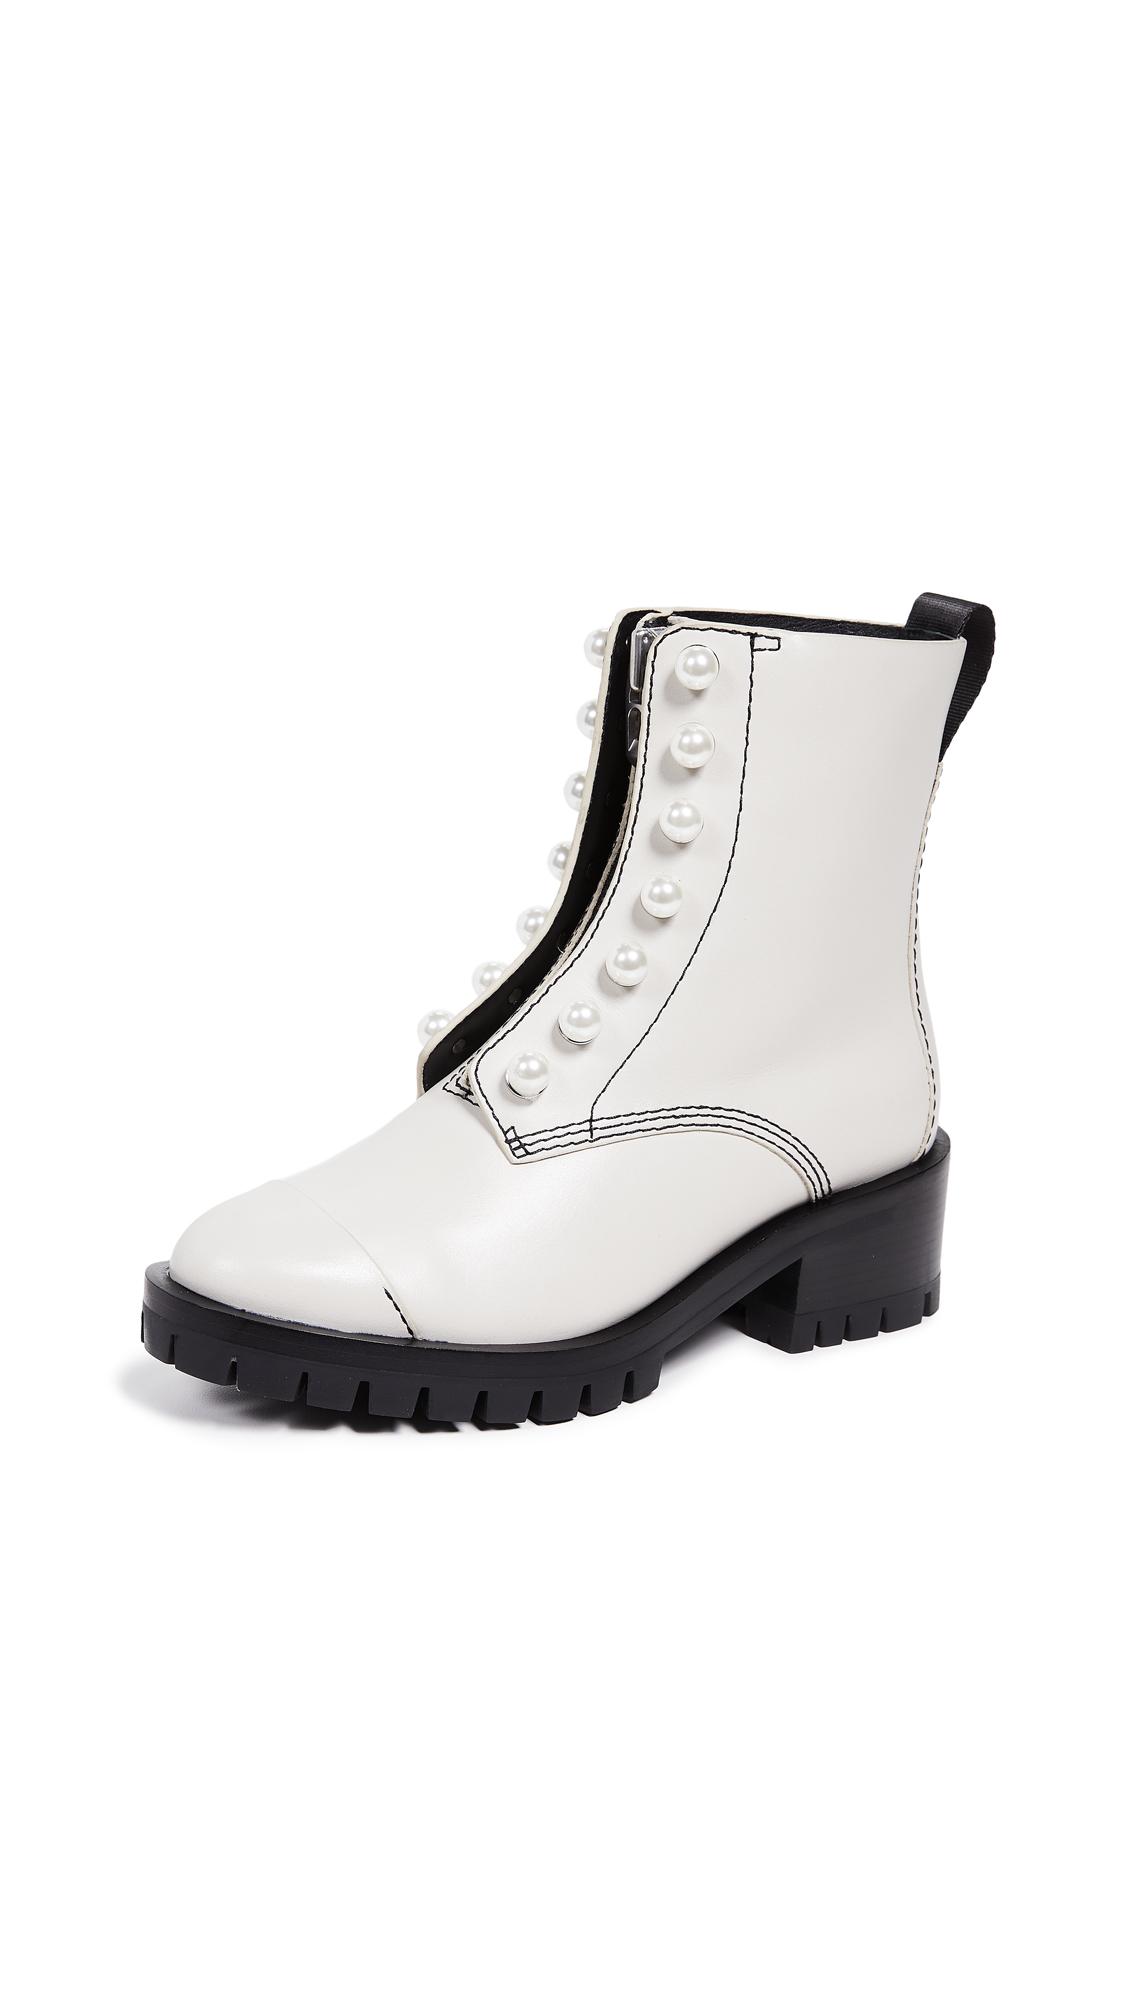 3.1 Phillip Lim Hayett Lug Sole Pearl Boots - Pale Grey